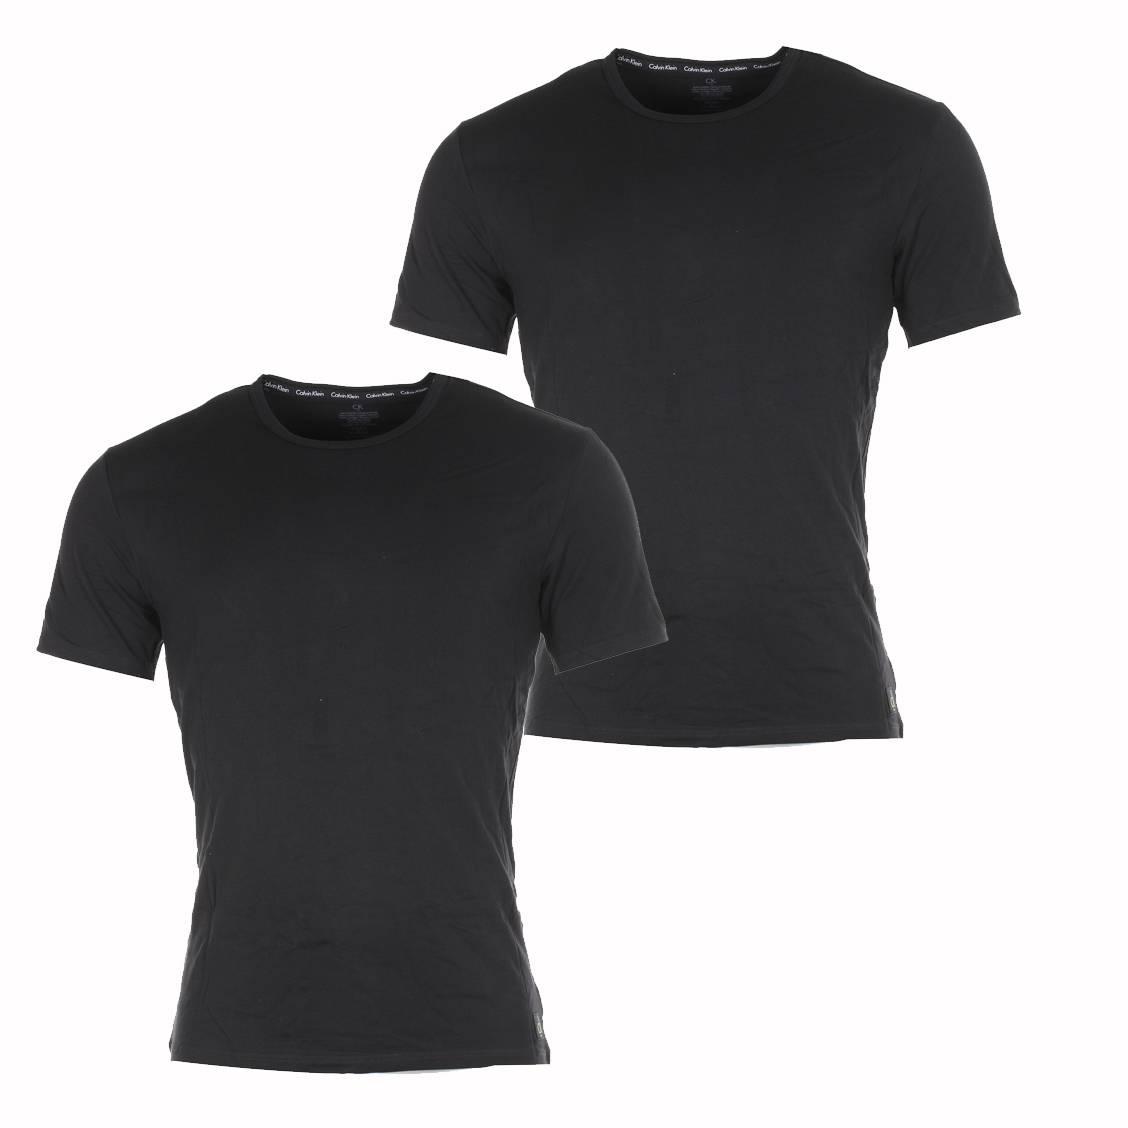 lot de 2 tee shirts noir col rond calvin klein rue des. Black Bedroom Furniture Sets. Home Design Ideas